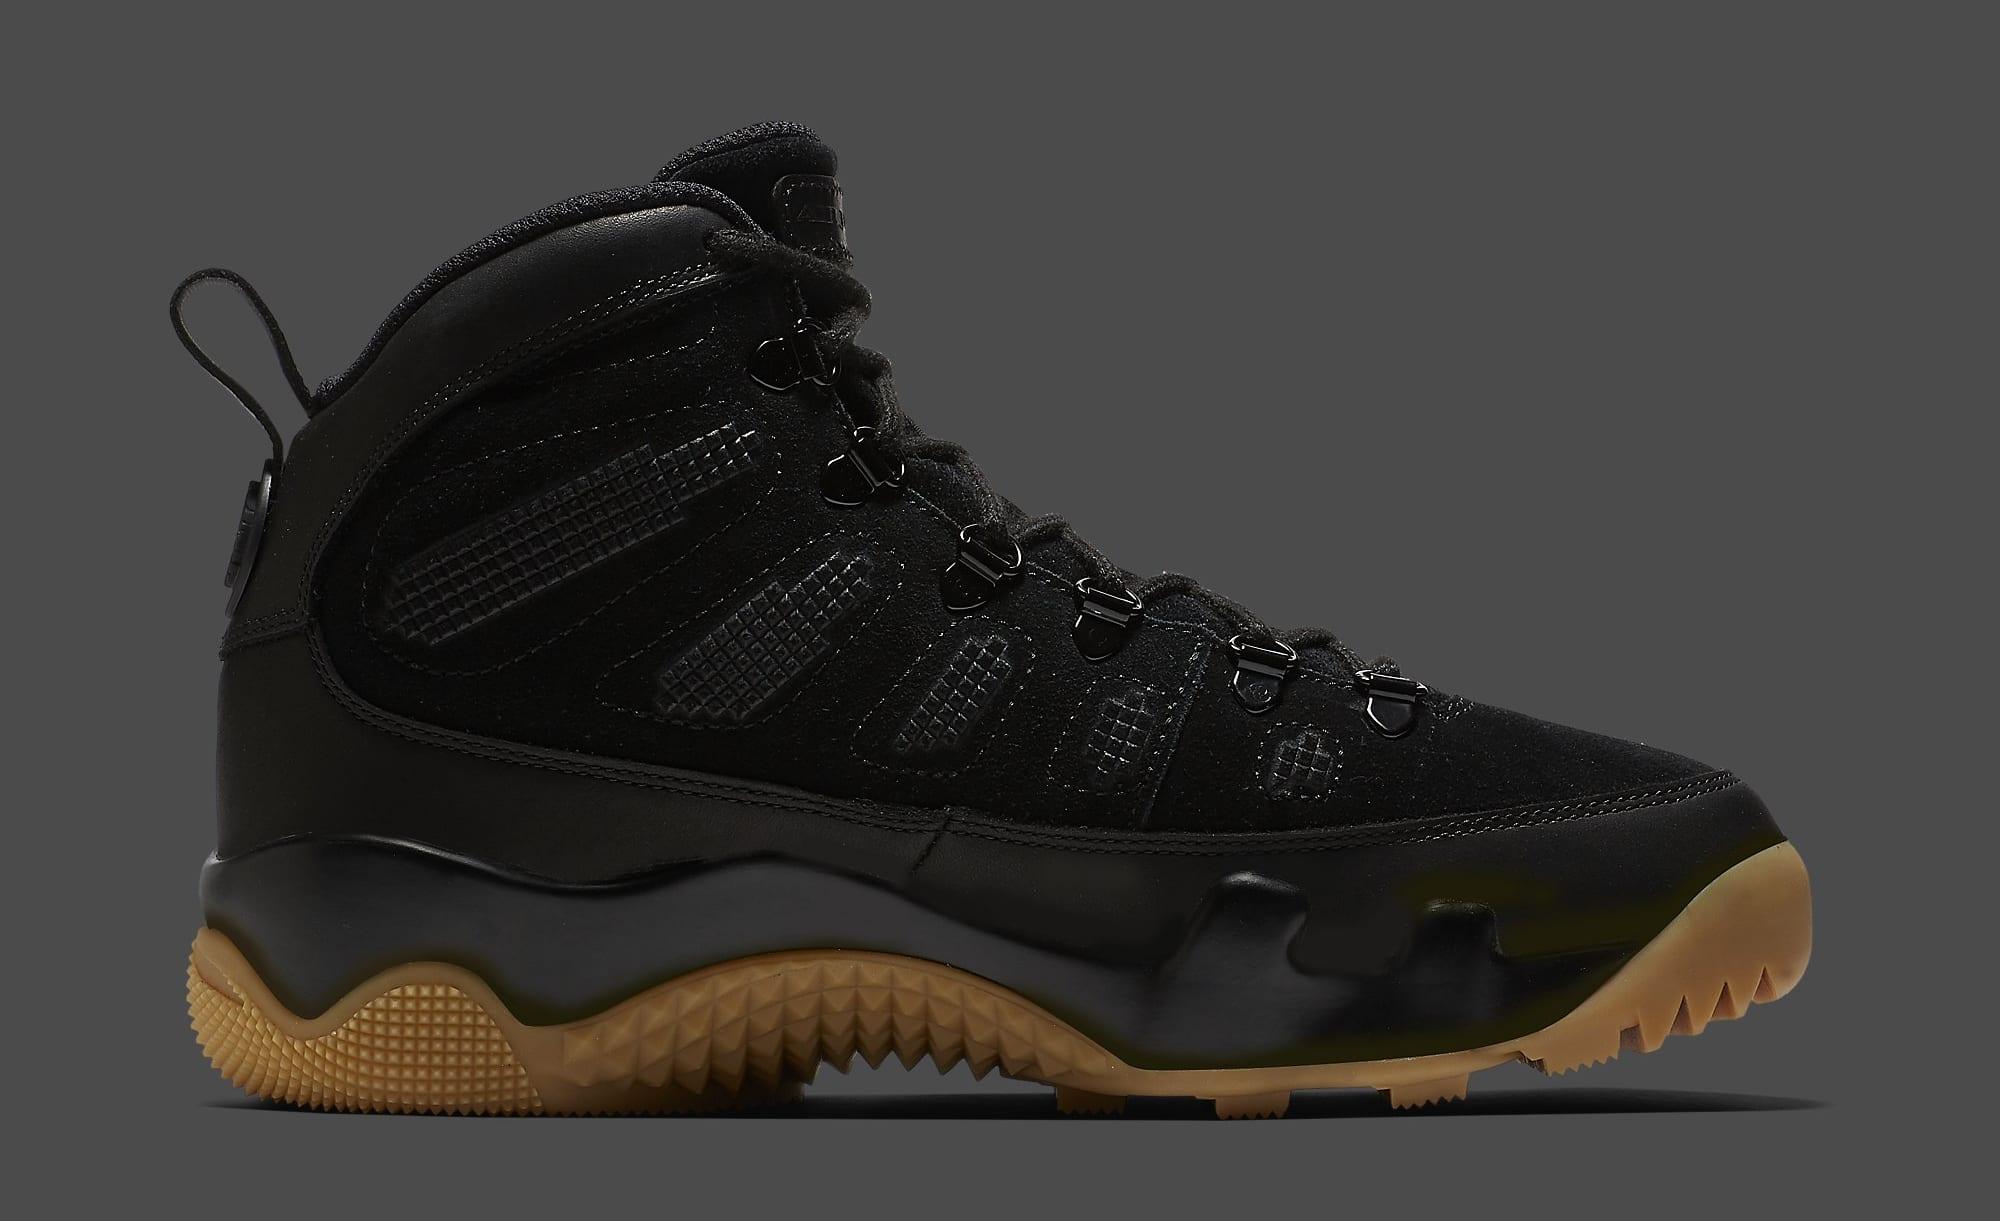 e933e1fef73345 ... Release Date  Image via Nike Air Jordan 9 Boot NRG AR4491-025 ...